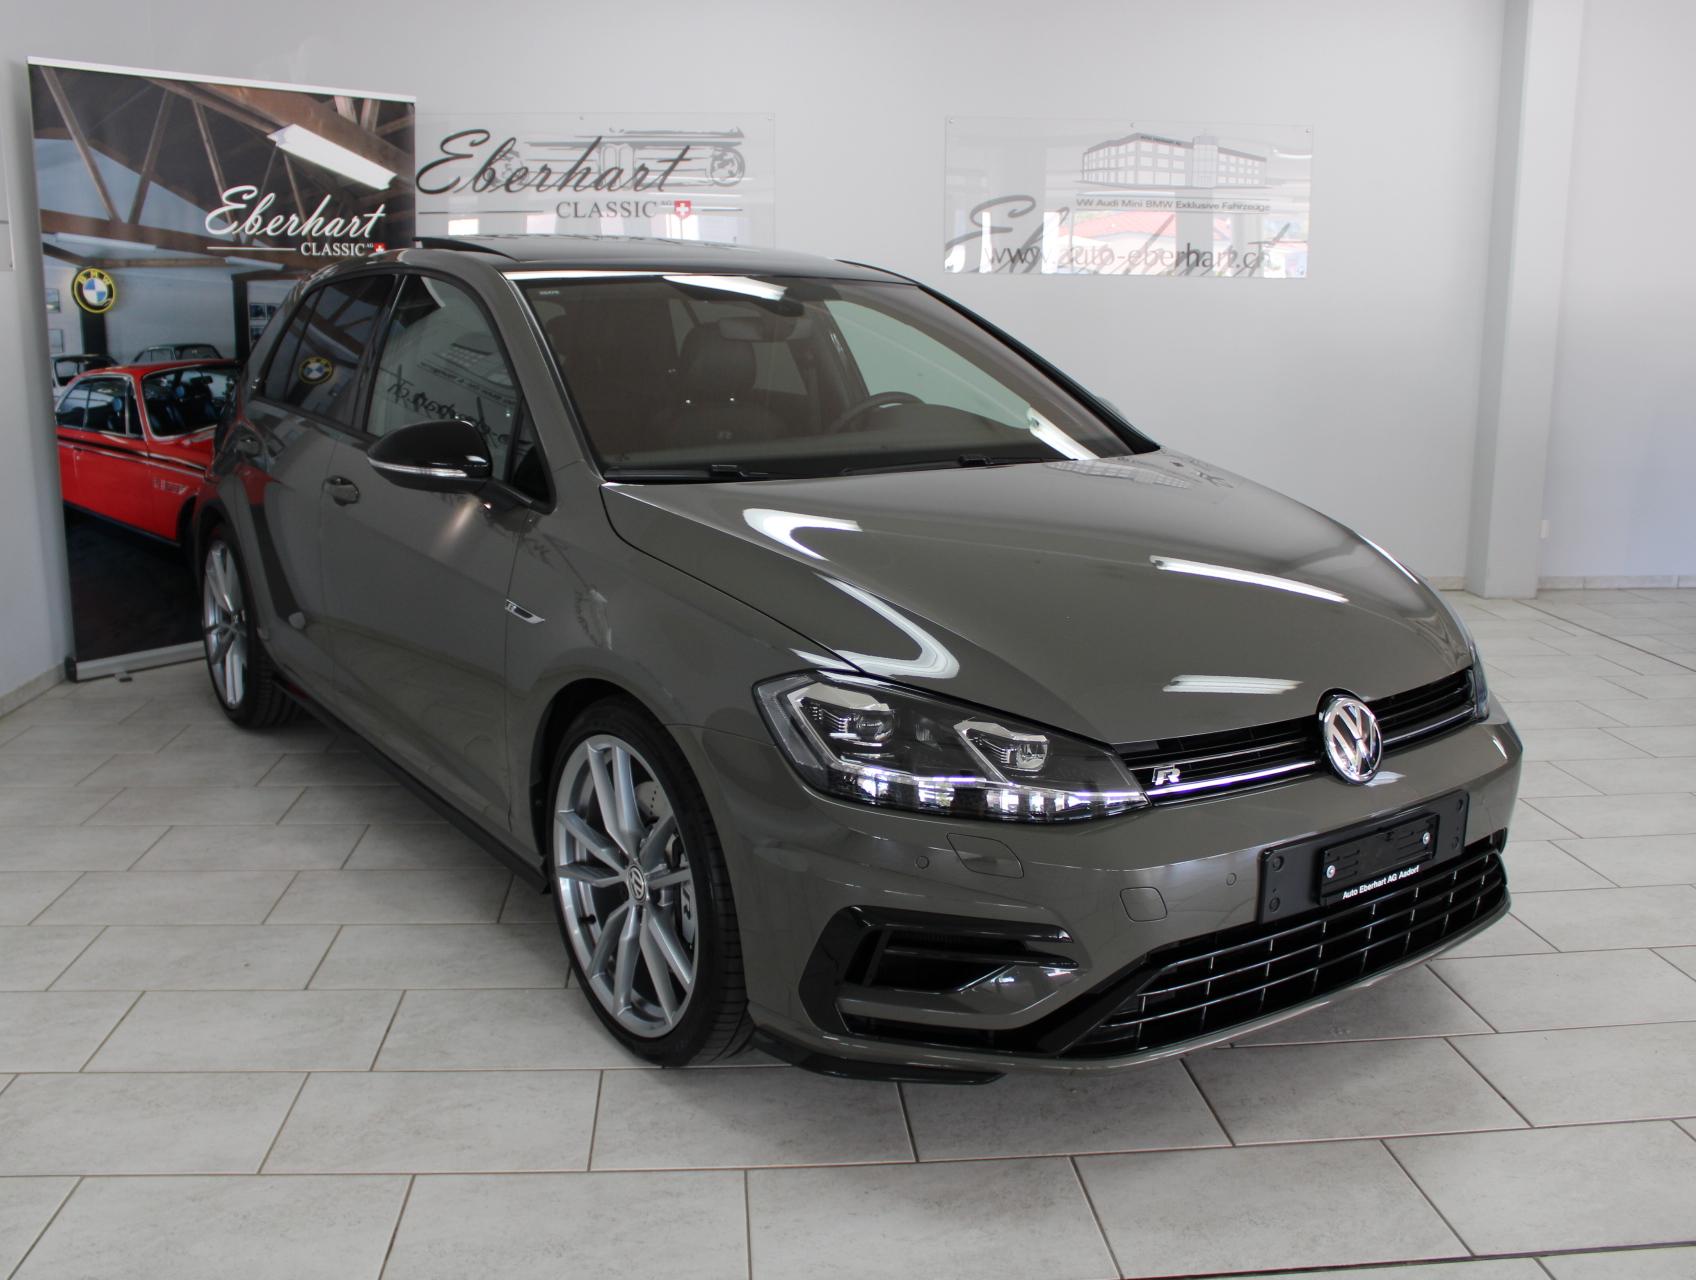 saloon VW Golf 2.0 TSI R 4motion